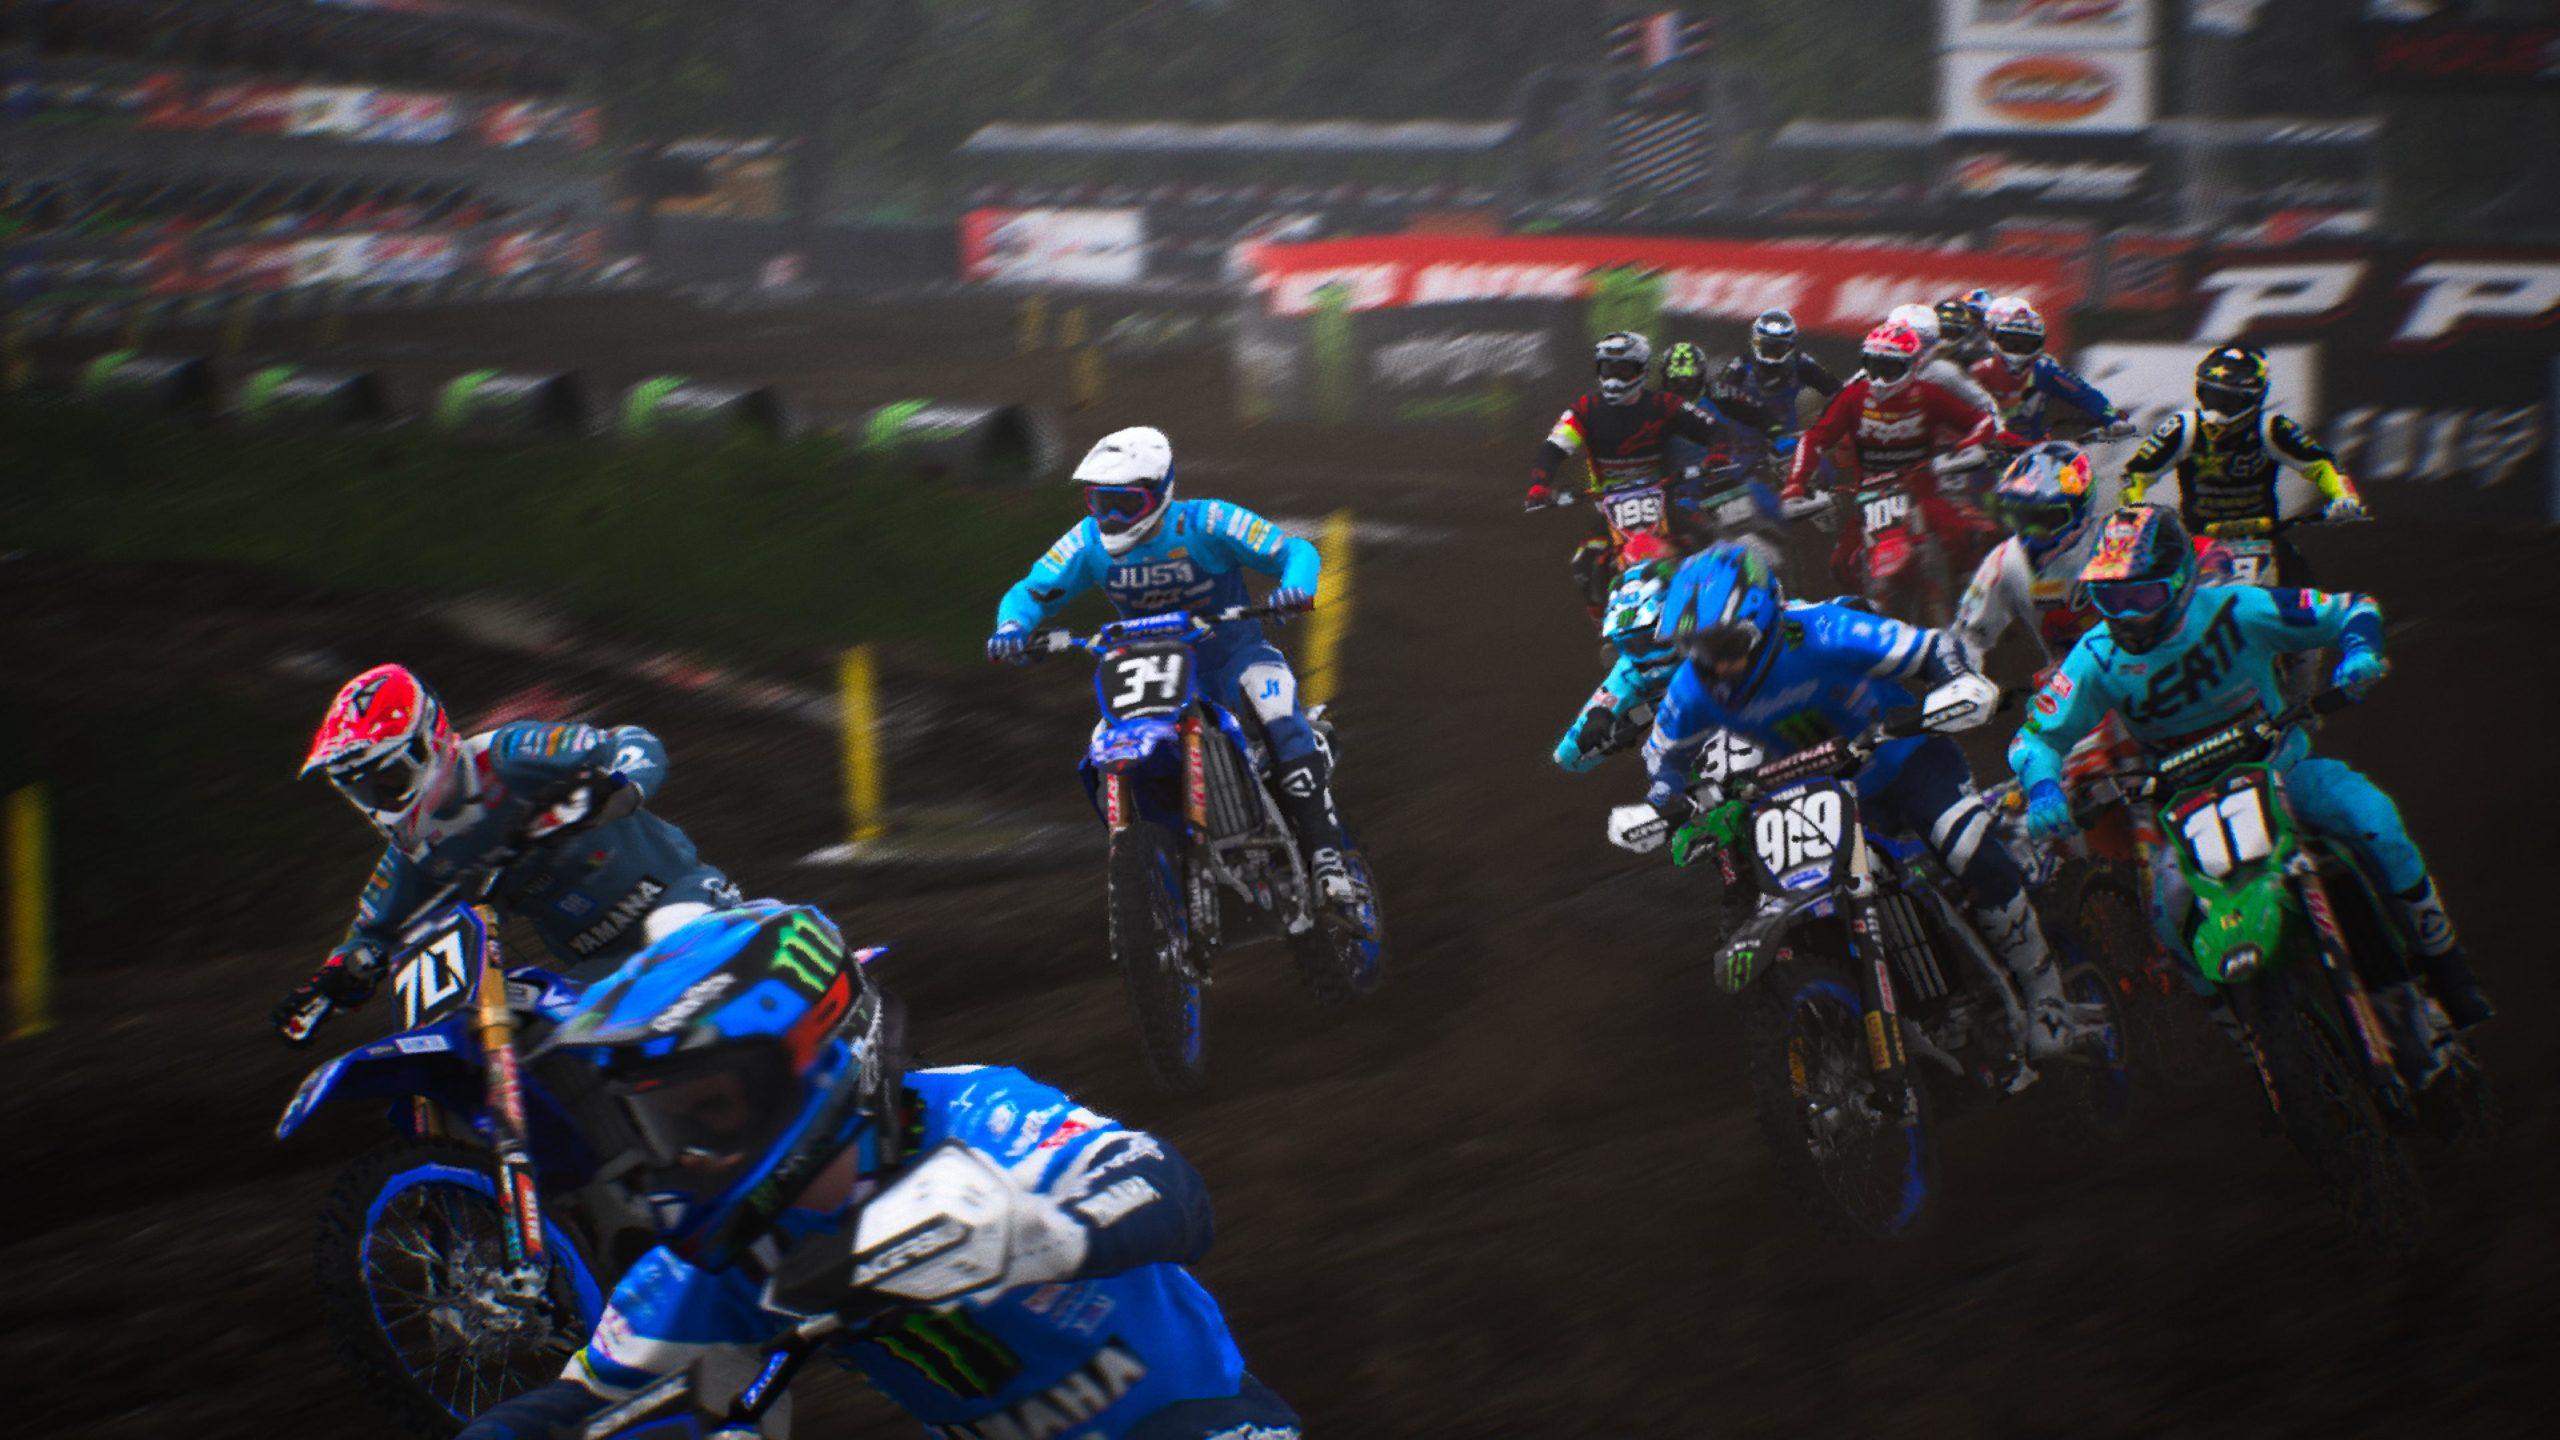 MXGP 2020 - The Official Motocross Videogame_20201218114258